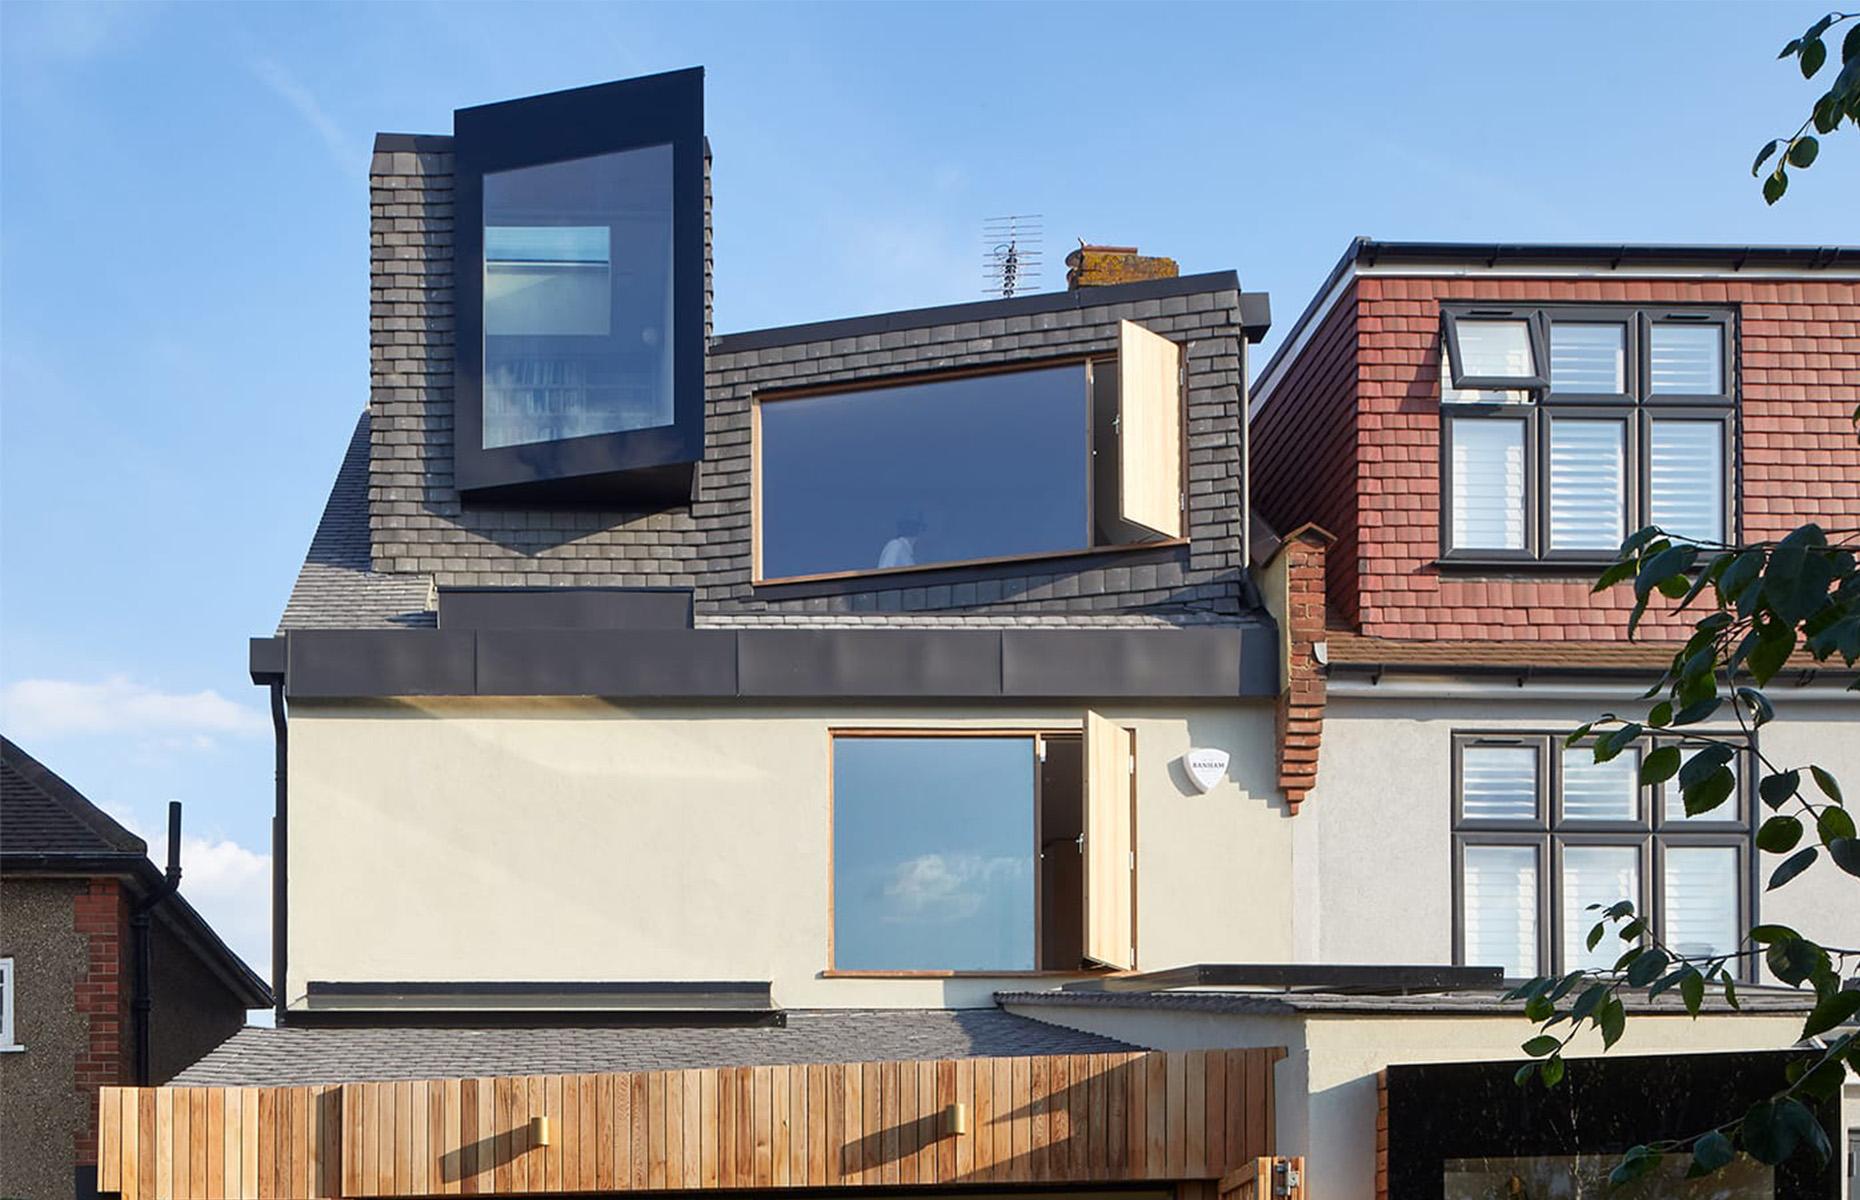 This innovative loft conversion was shortlisted for NLA's Don't Move, Improve! awards. Image: Edmund Sumner / Rise Design Studio